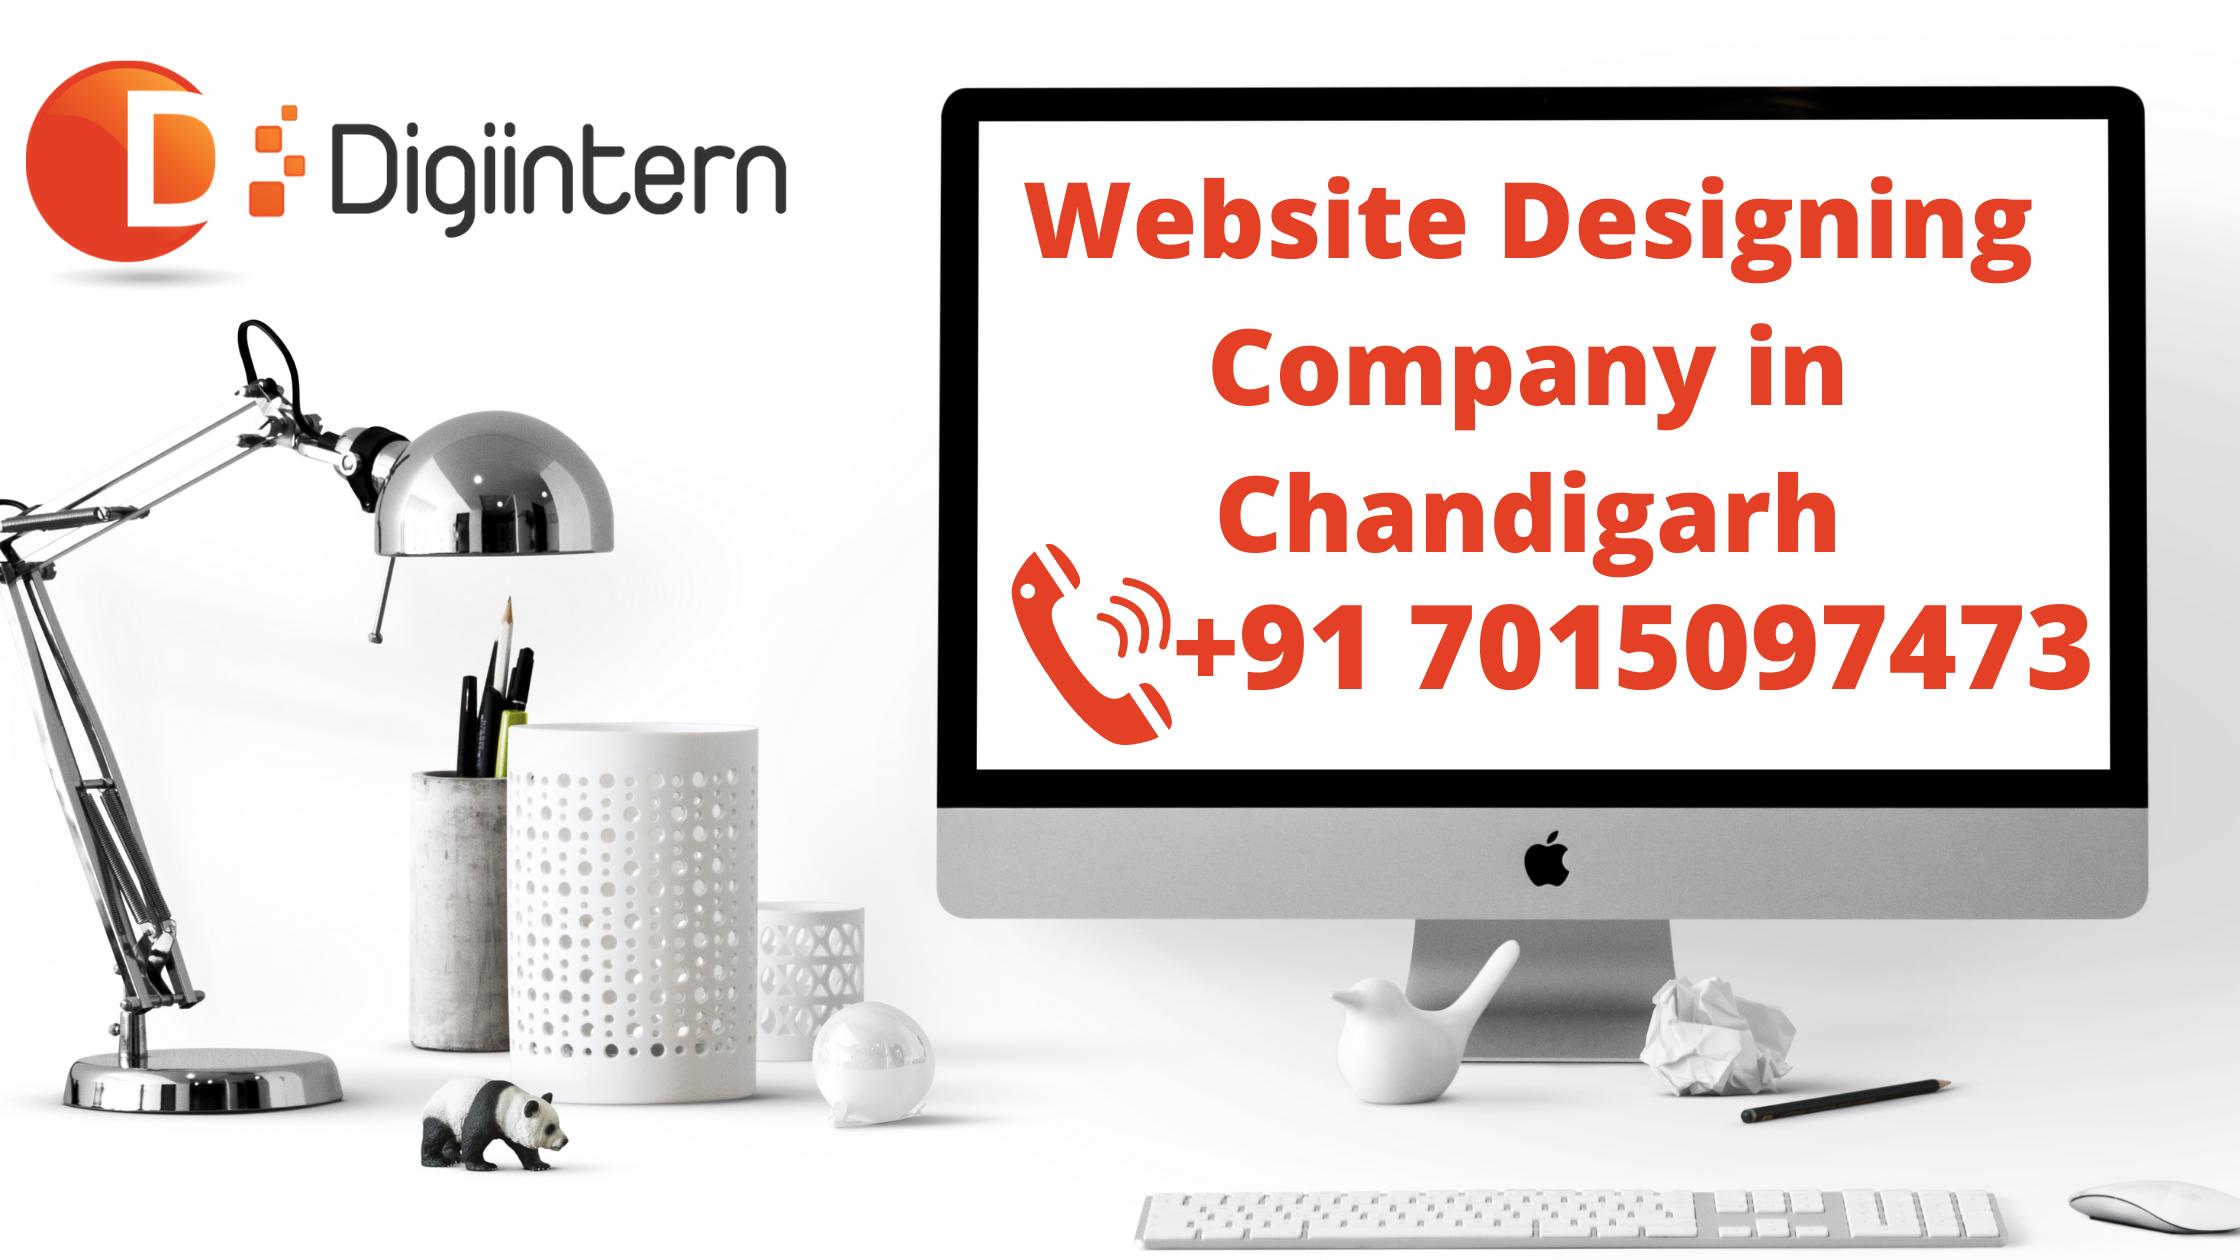 Website Designing Company in Chandīgarh